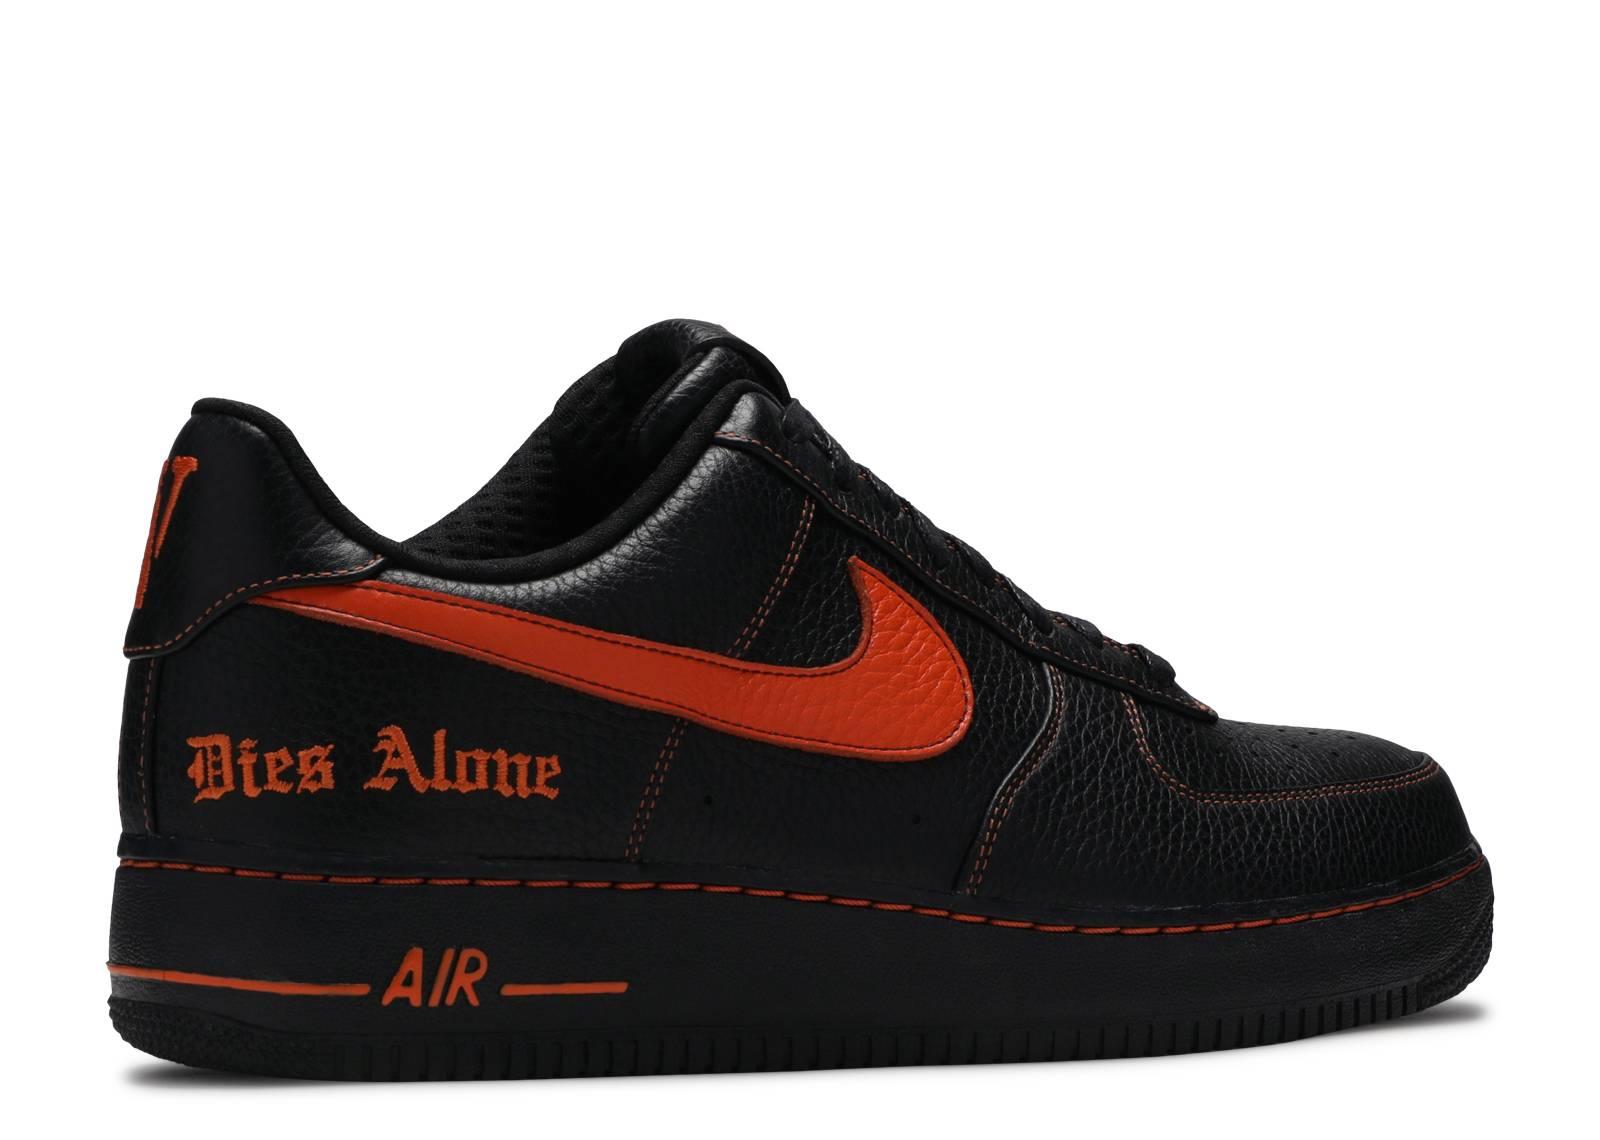 Vlone X NikeLab Air Force 1 'Vlone' - Nike - AA5360 001 - black ...